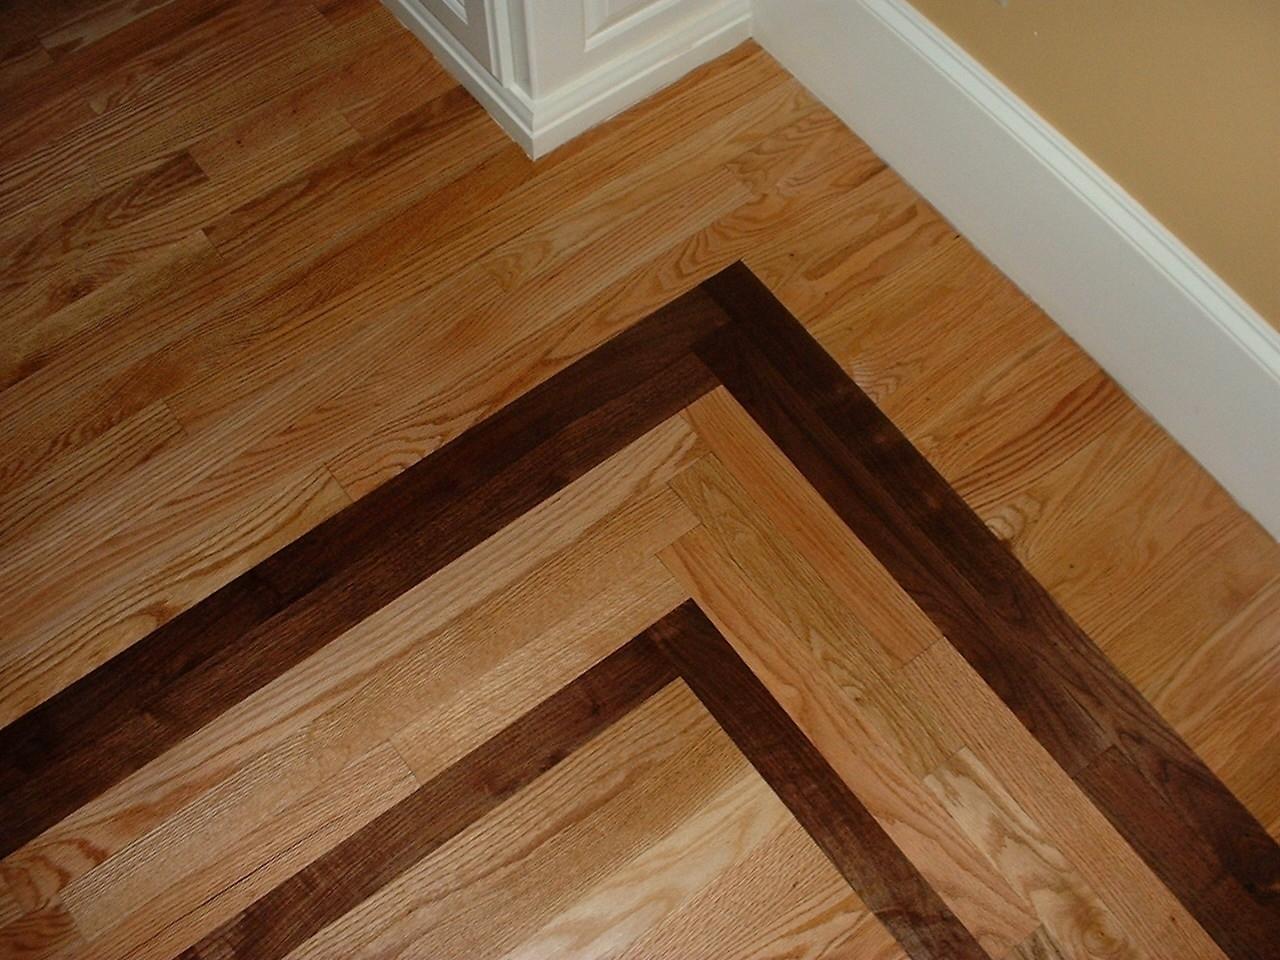 Hardwood Floor Inlay Designs  Madison Art Center Design